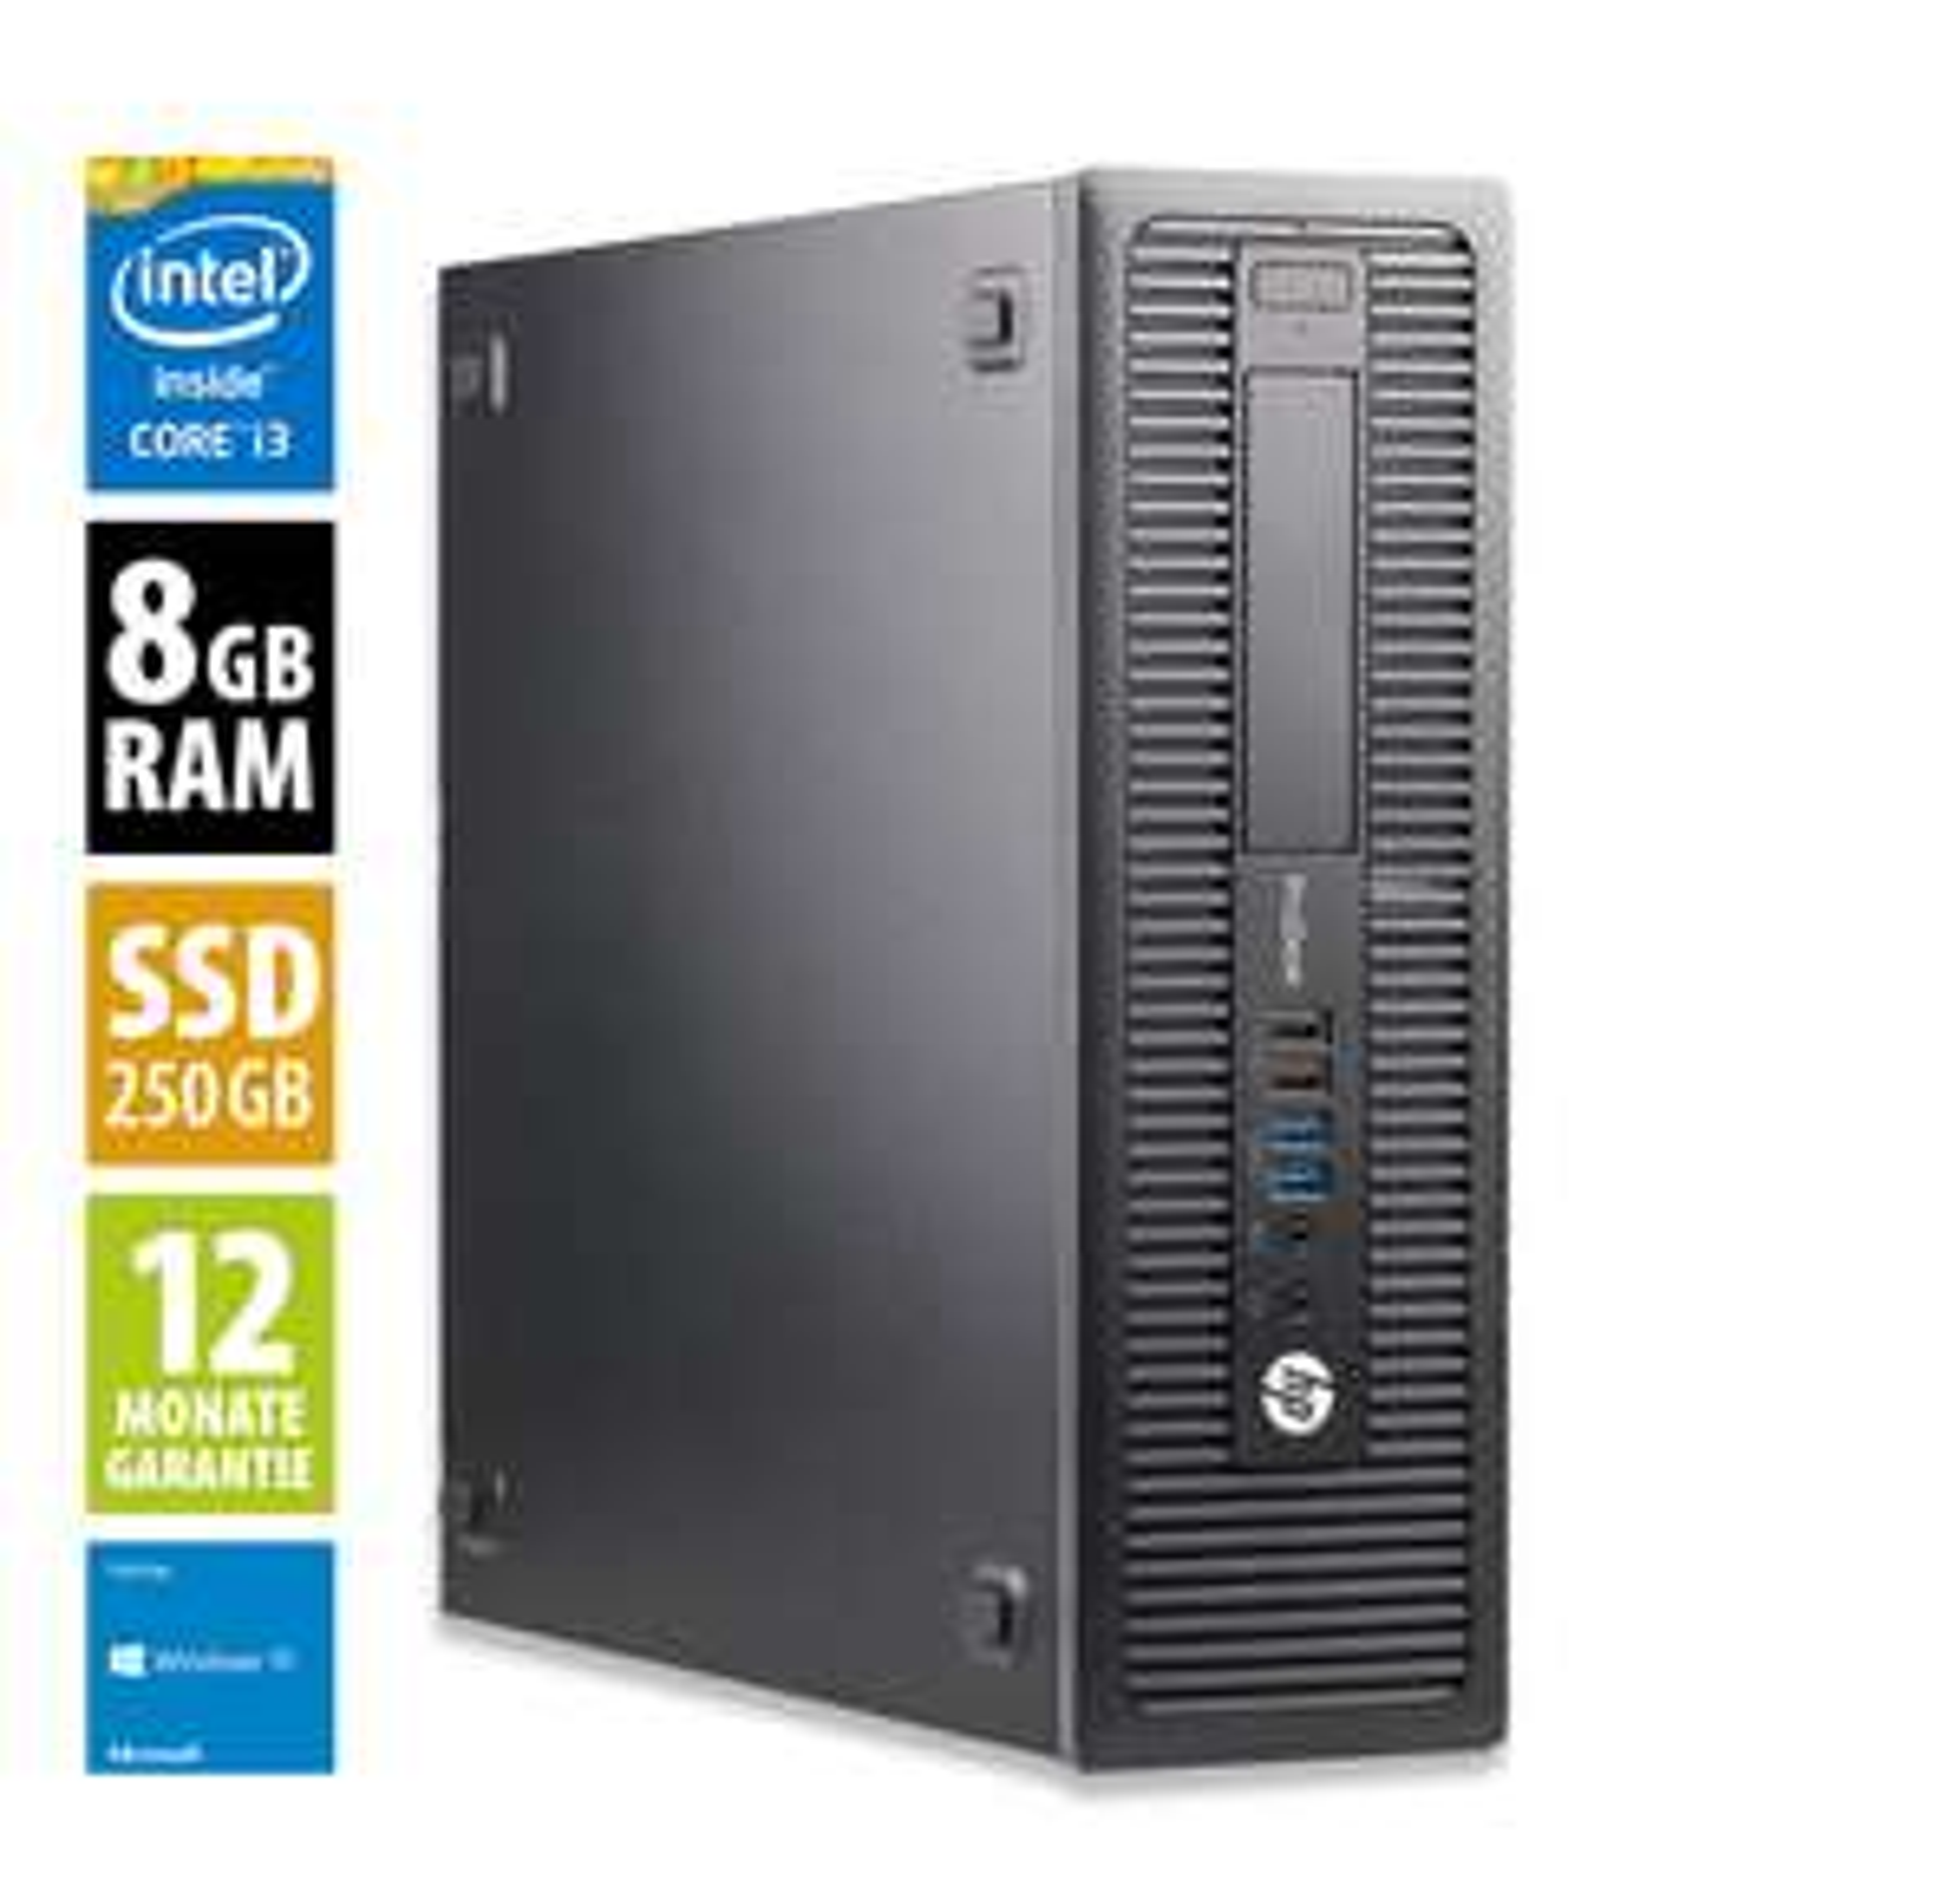 Office-Rechner von AfB, HP ProDesk 600 G1 SFF - Core i3-4130 @ 3,4 GHz - 8GB RAM - 250GB SSD - Win10Home